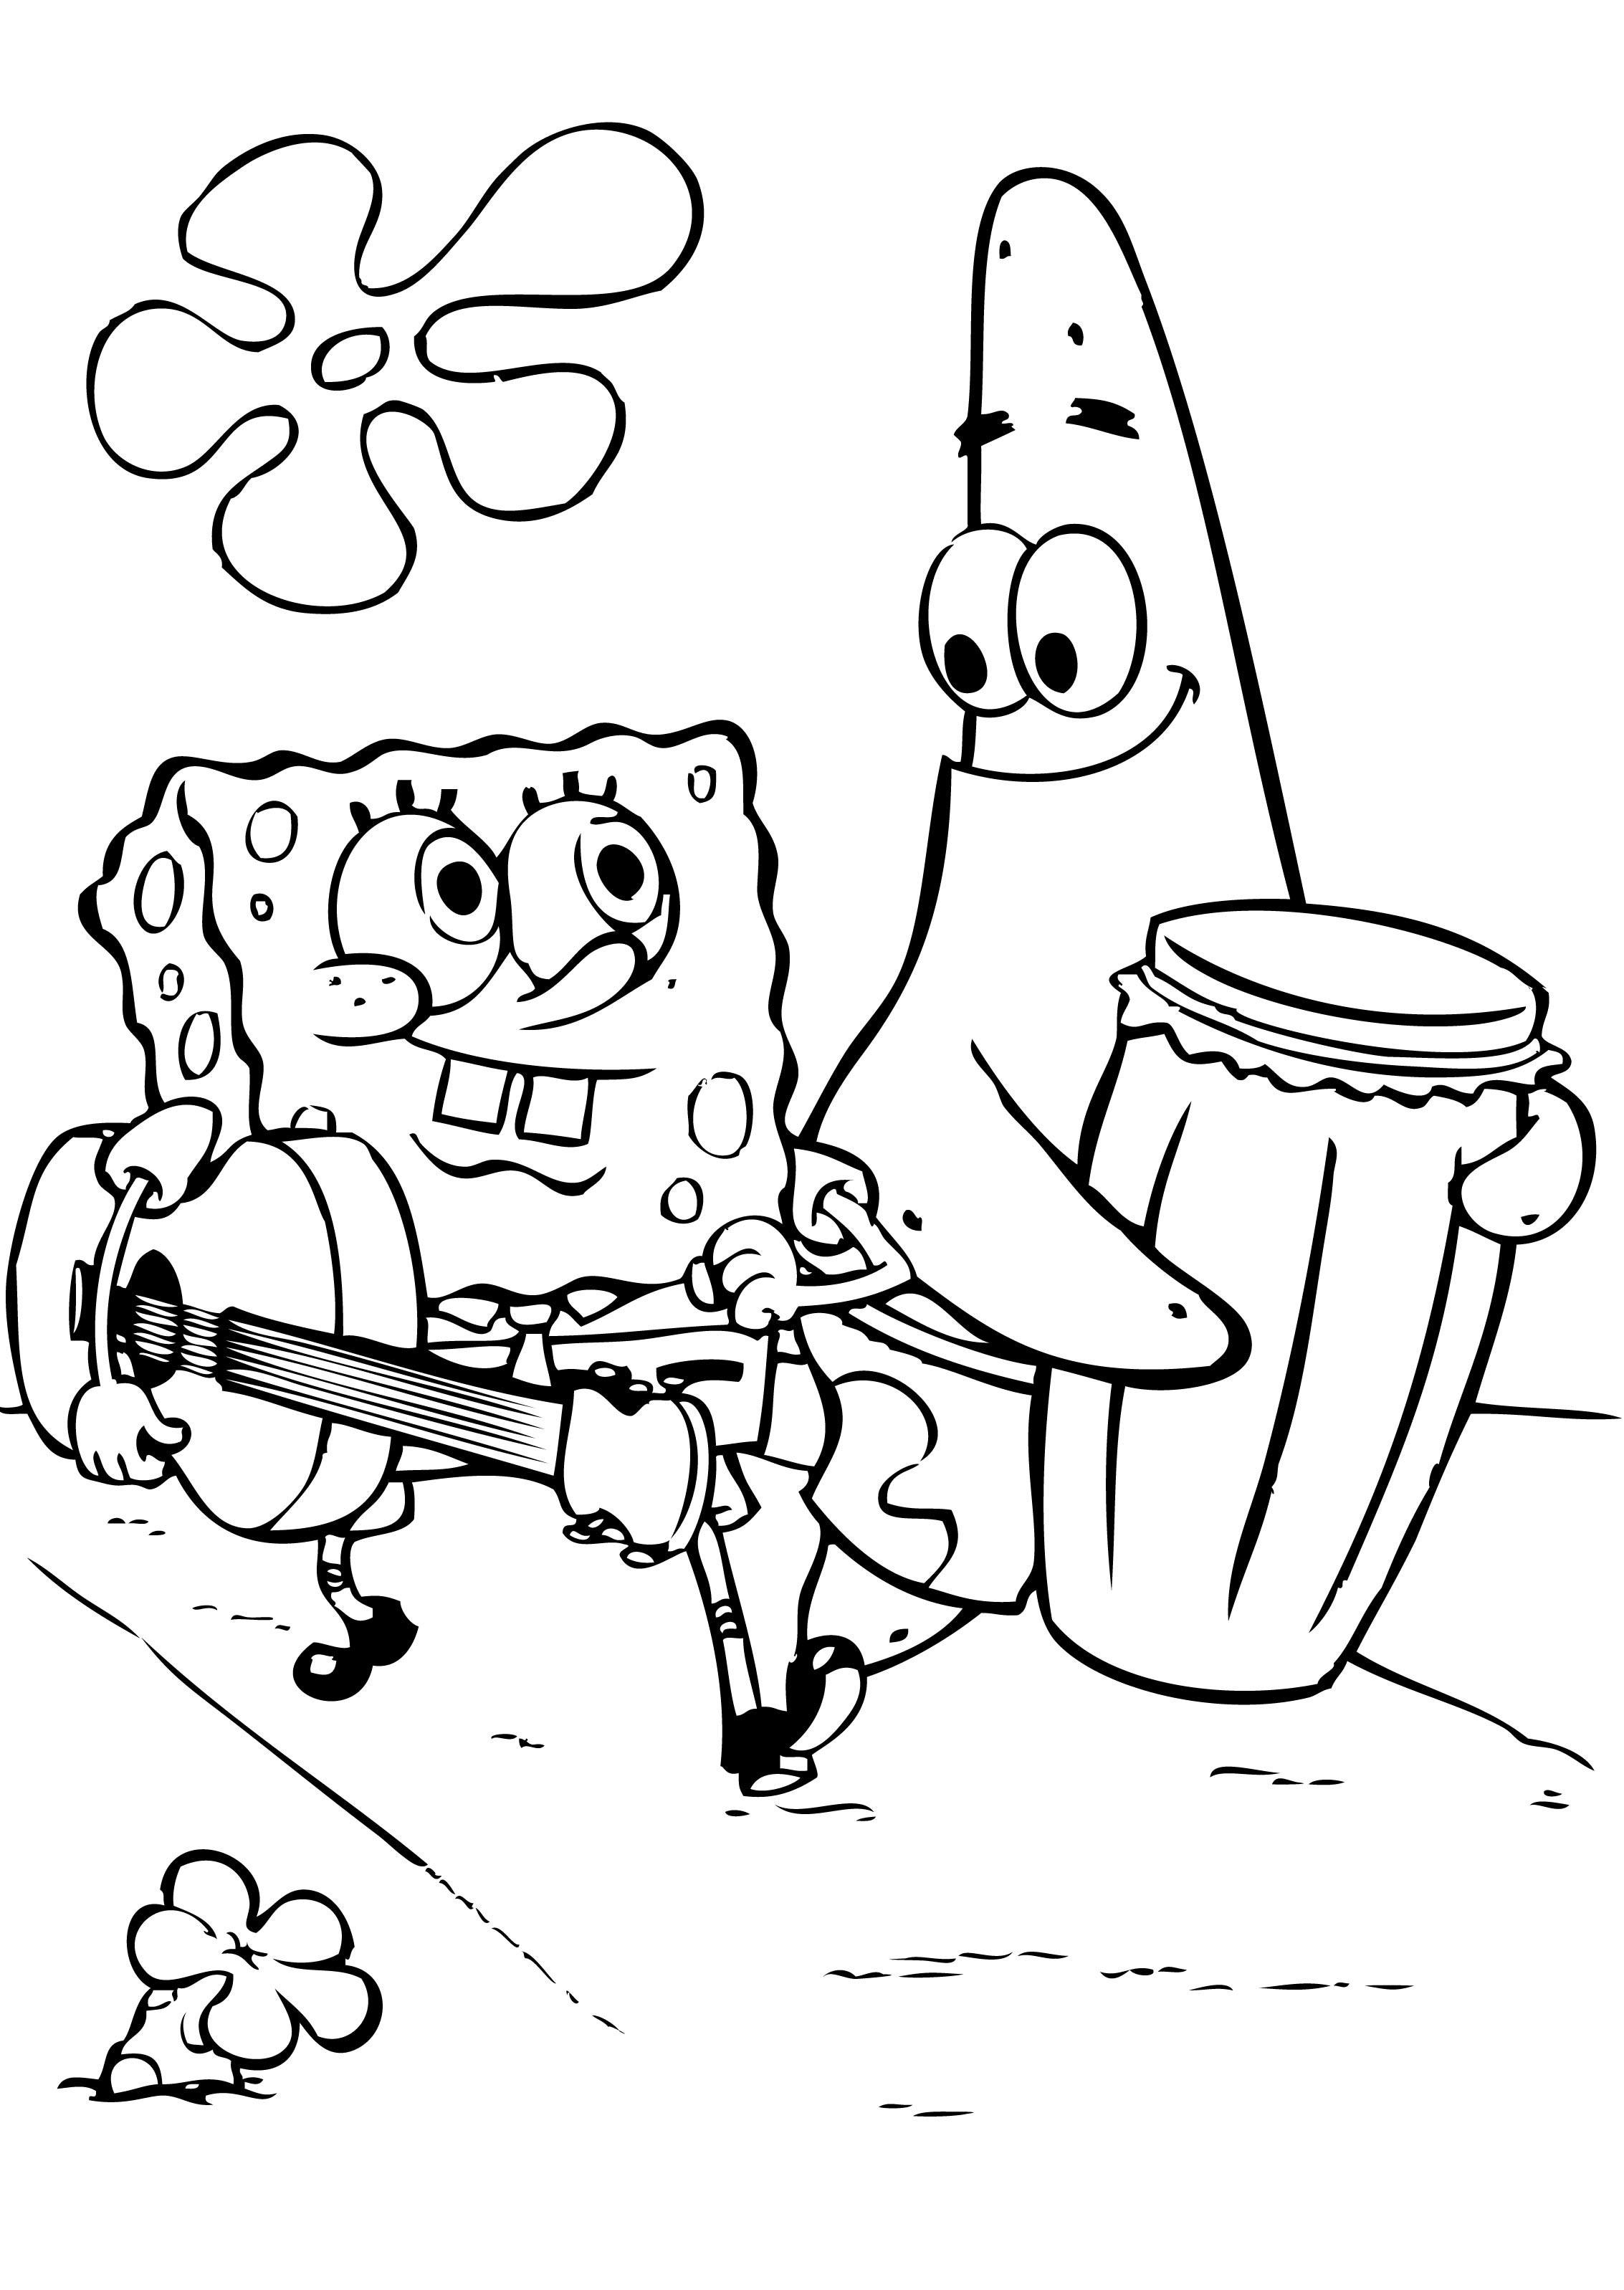 Sponge Bob Coloring Pages - Spongebob Coloring Pages Free Rawesomeco - Spongebob Squarepants Coloring Pages Free Printable